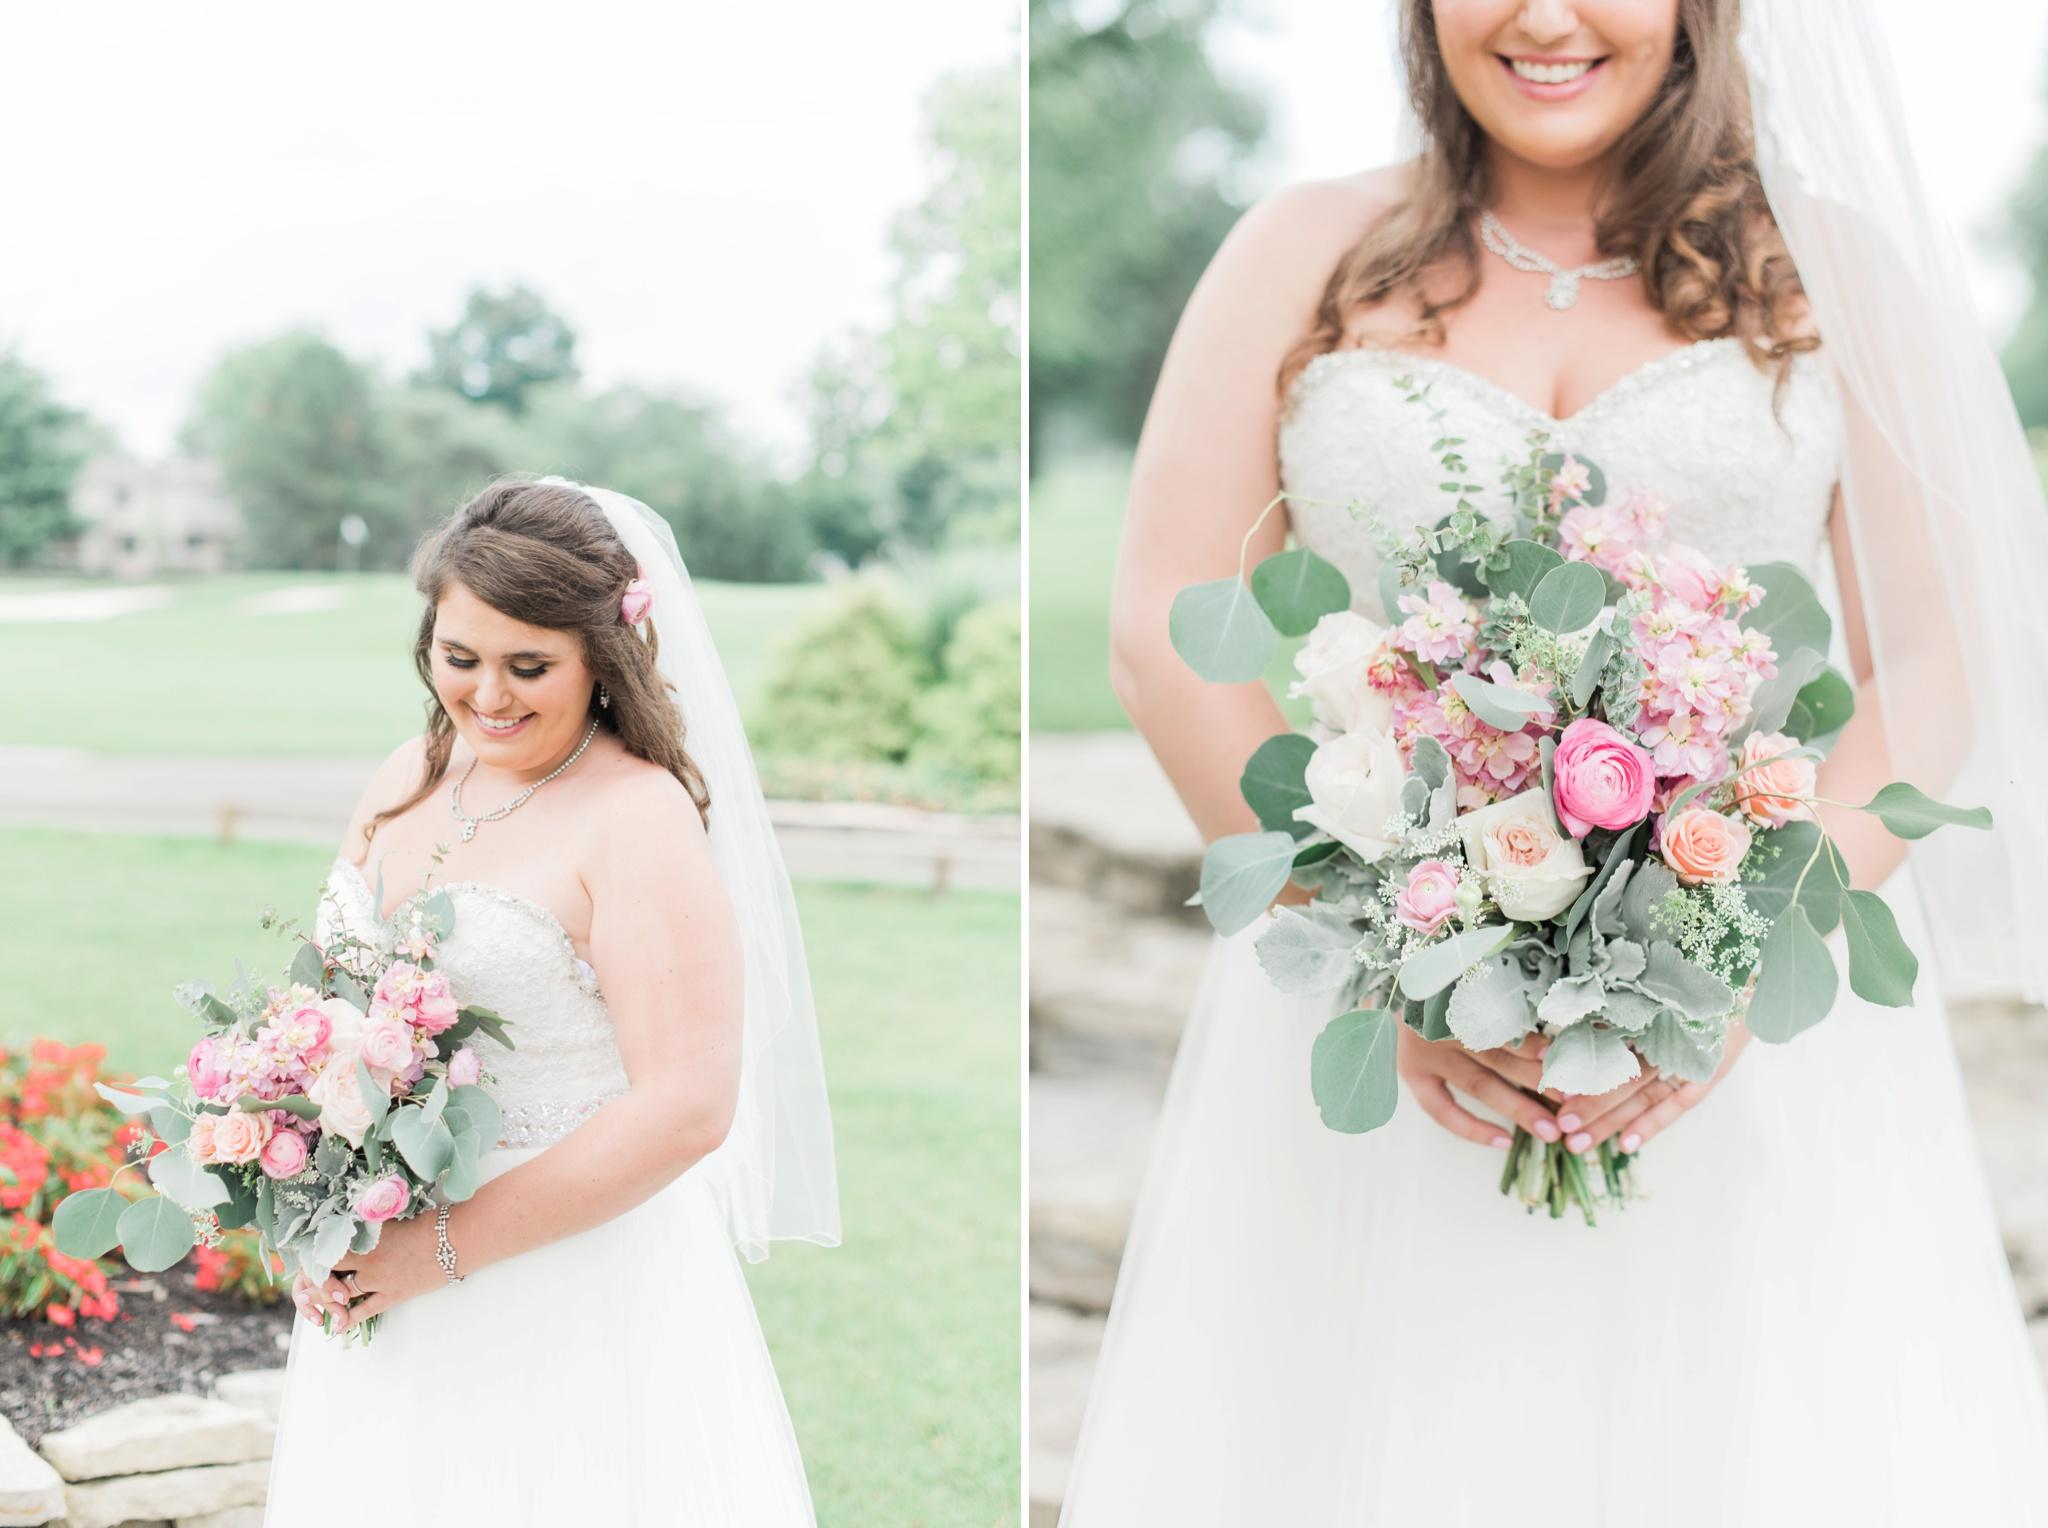 worthington-hills-country-club-wedding-columbus-ohio-meg-evan_0134.jpg